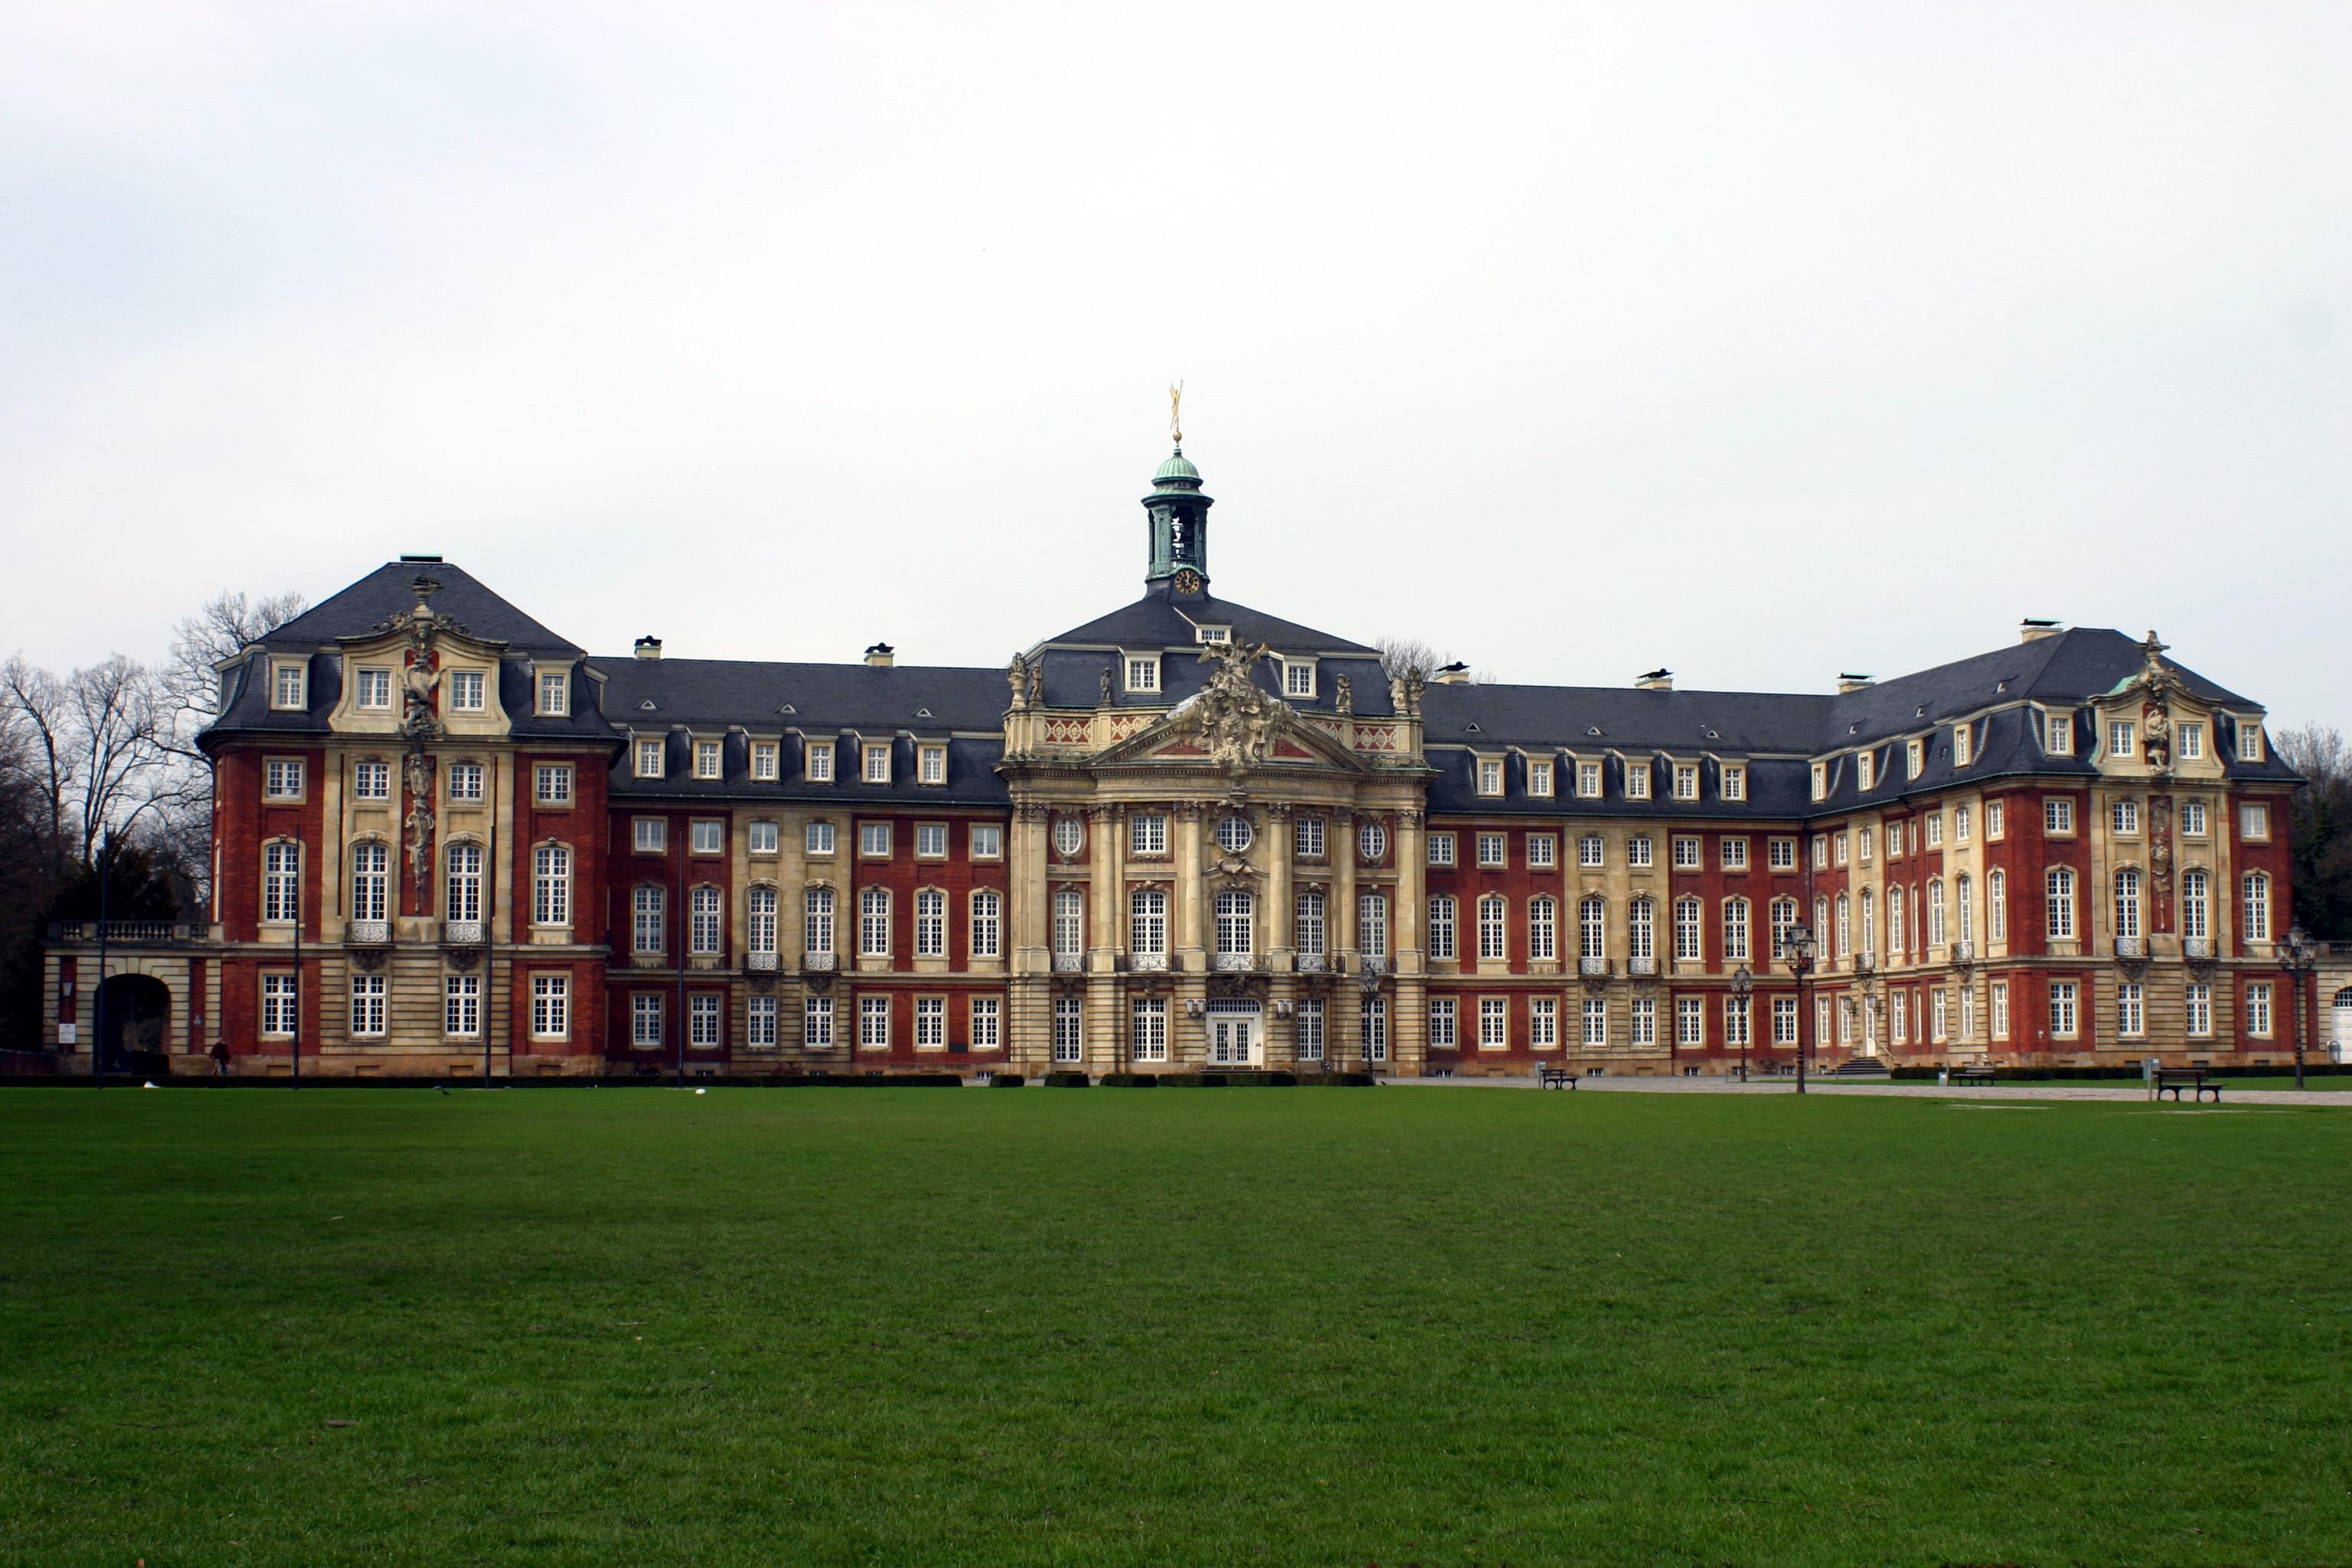 Muenster_Schloss_4256.jpg (3072×2048)